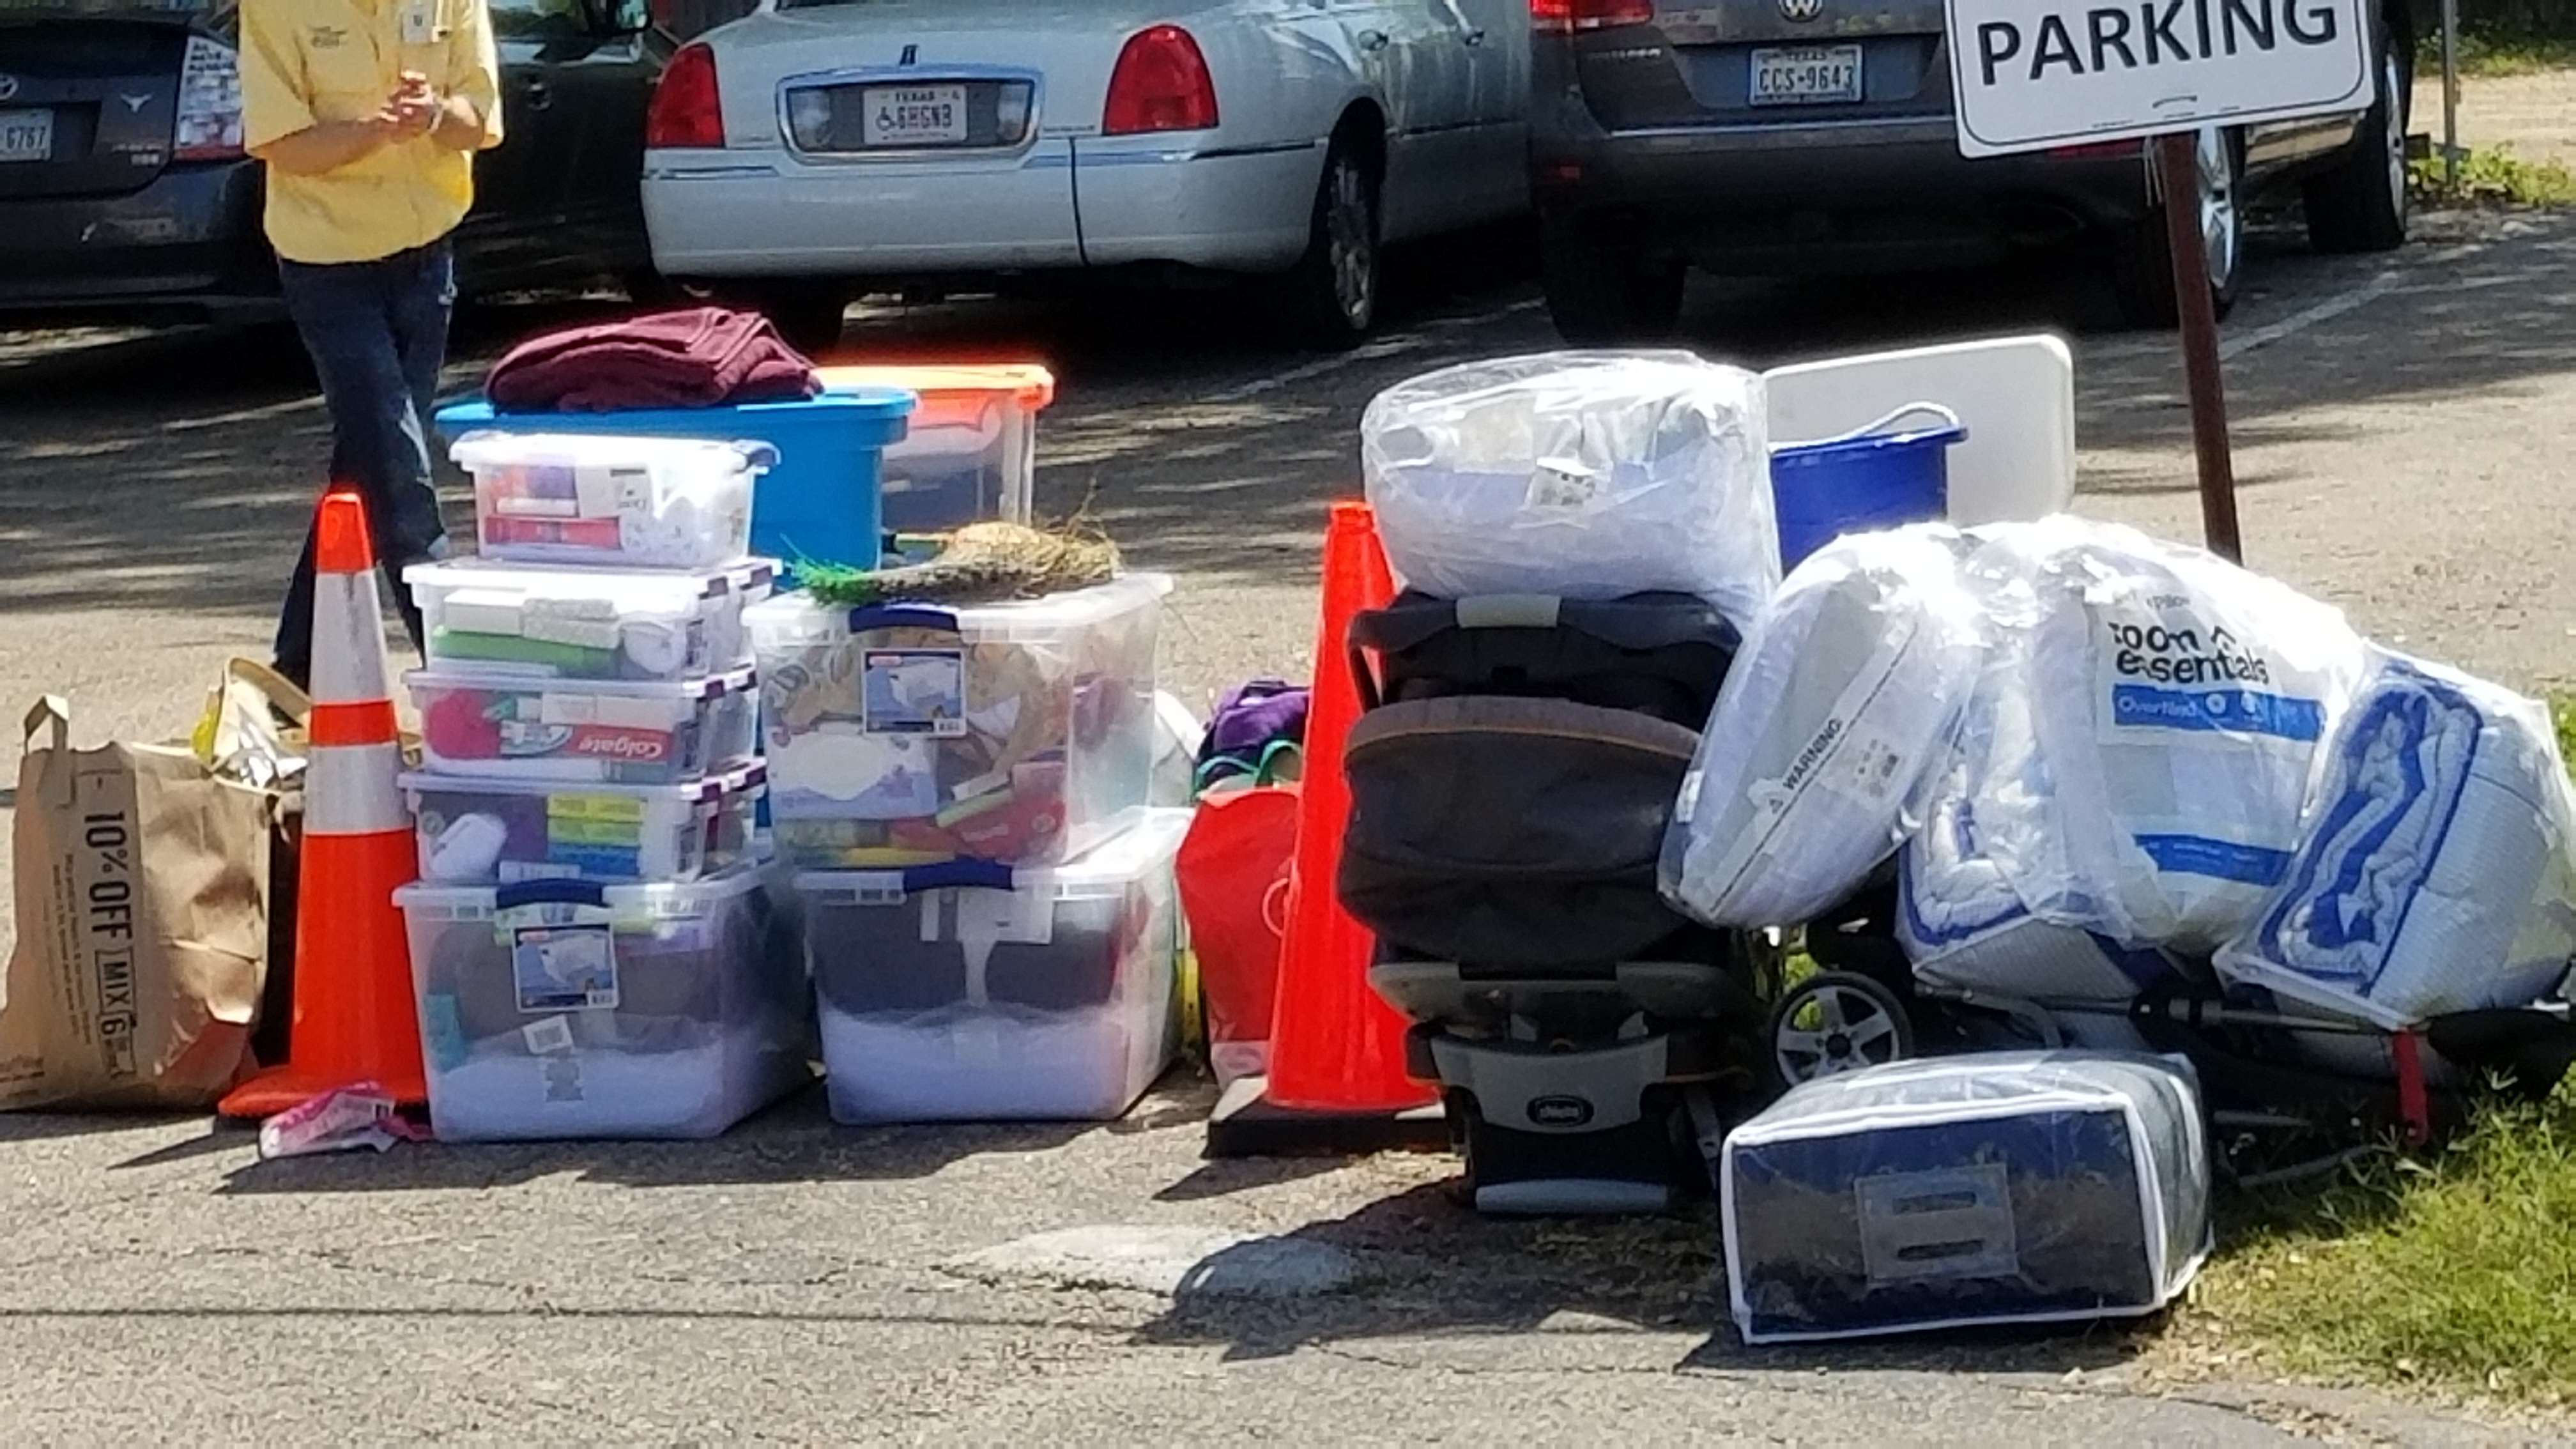 harvey donations in plastic in austin, TX